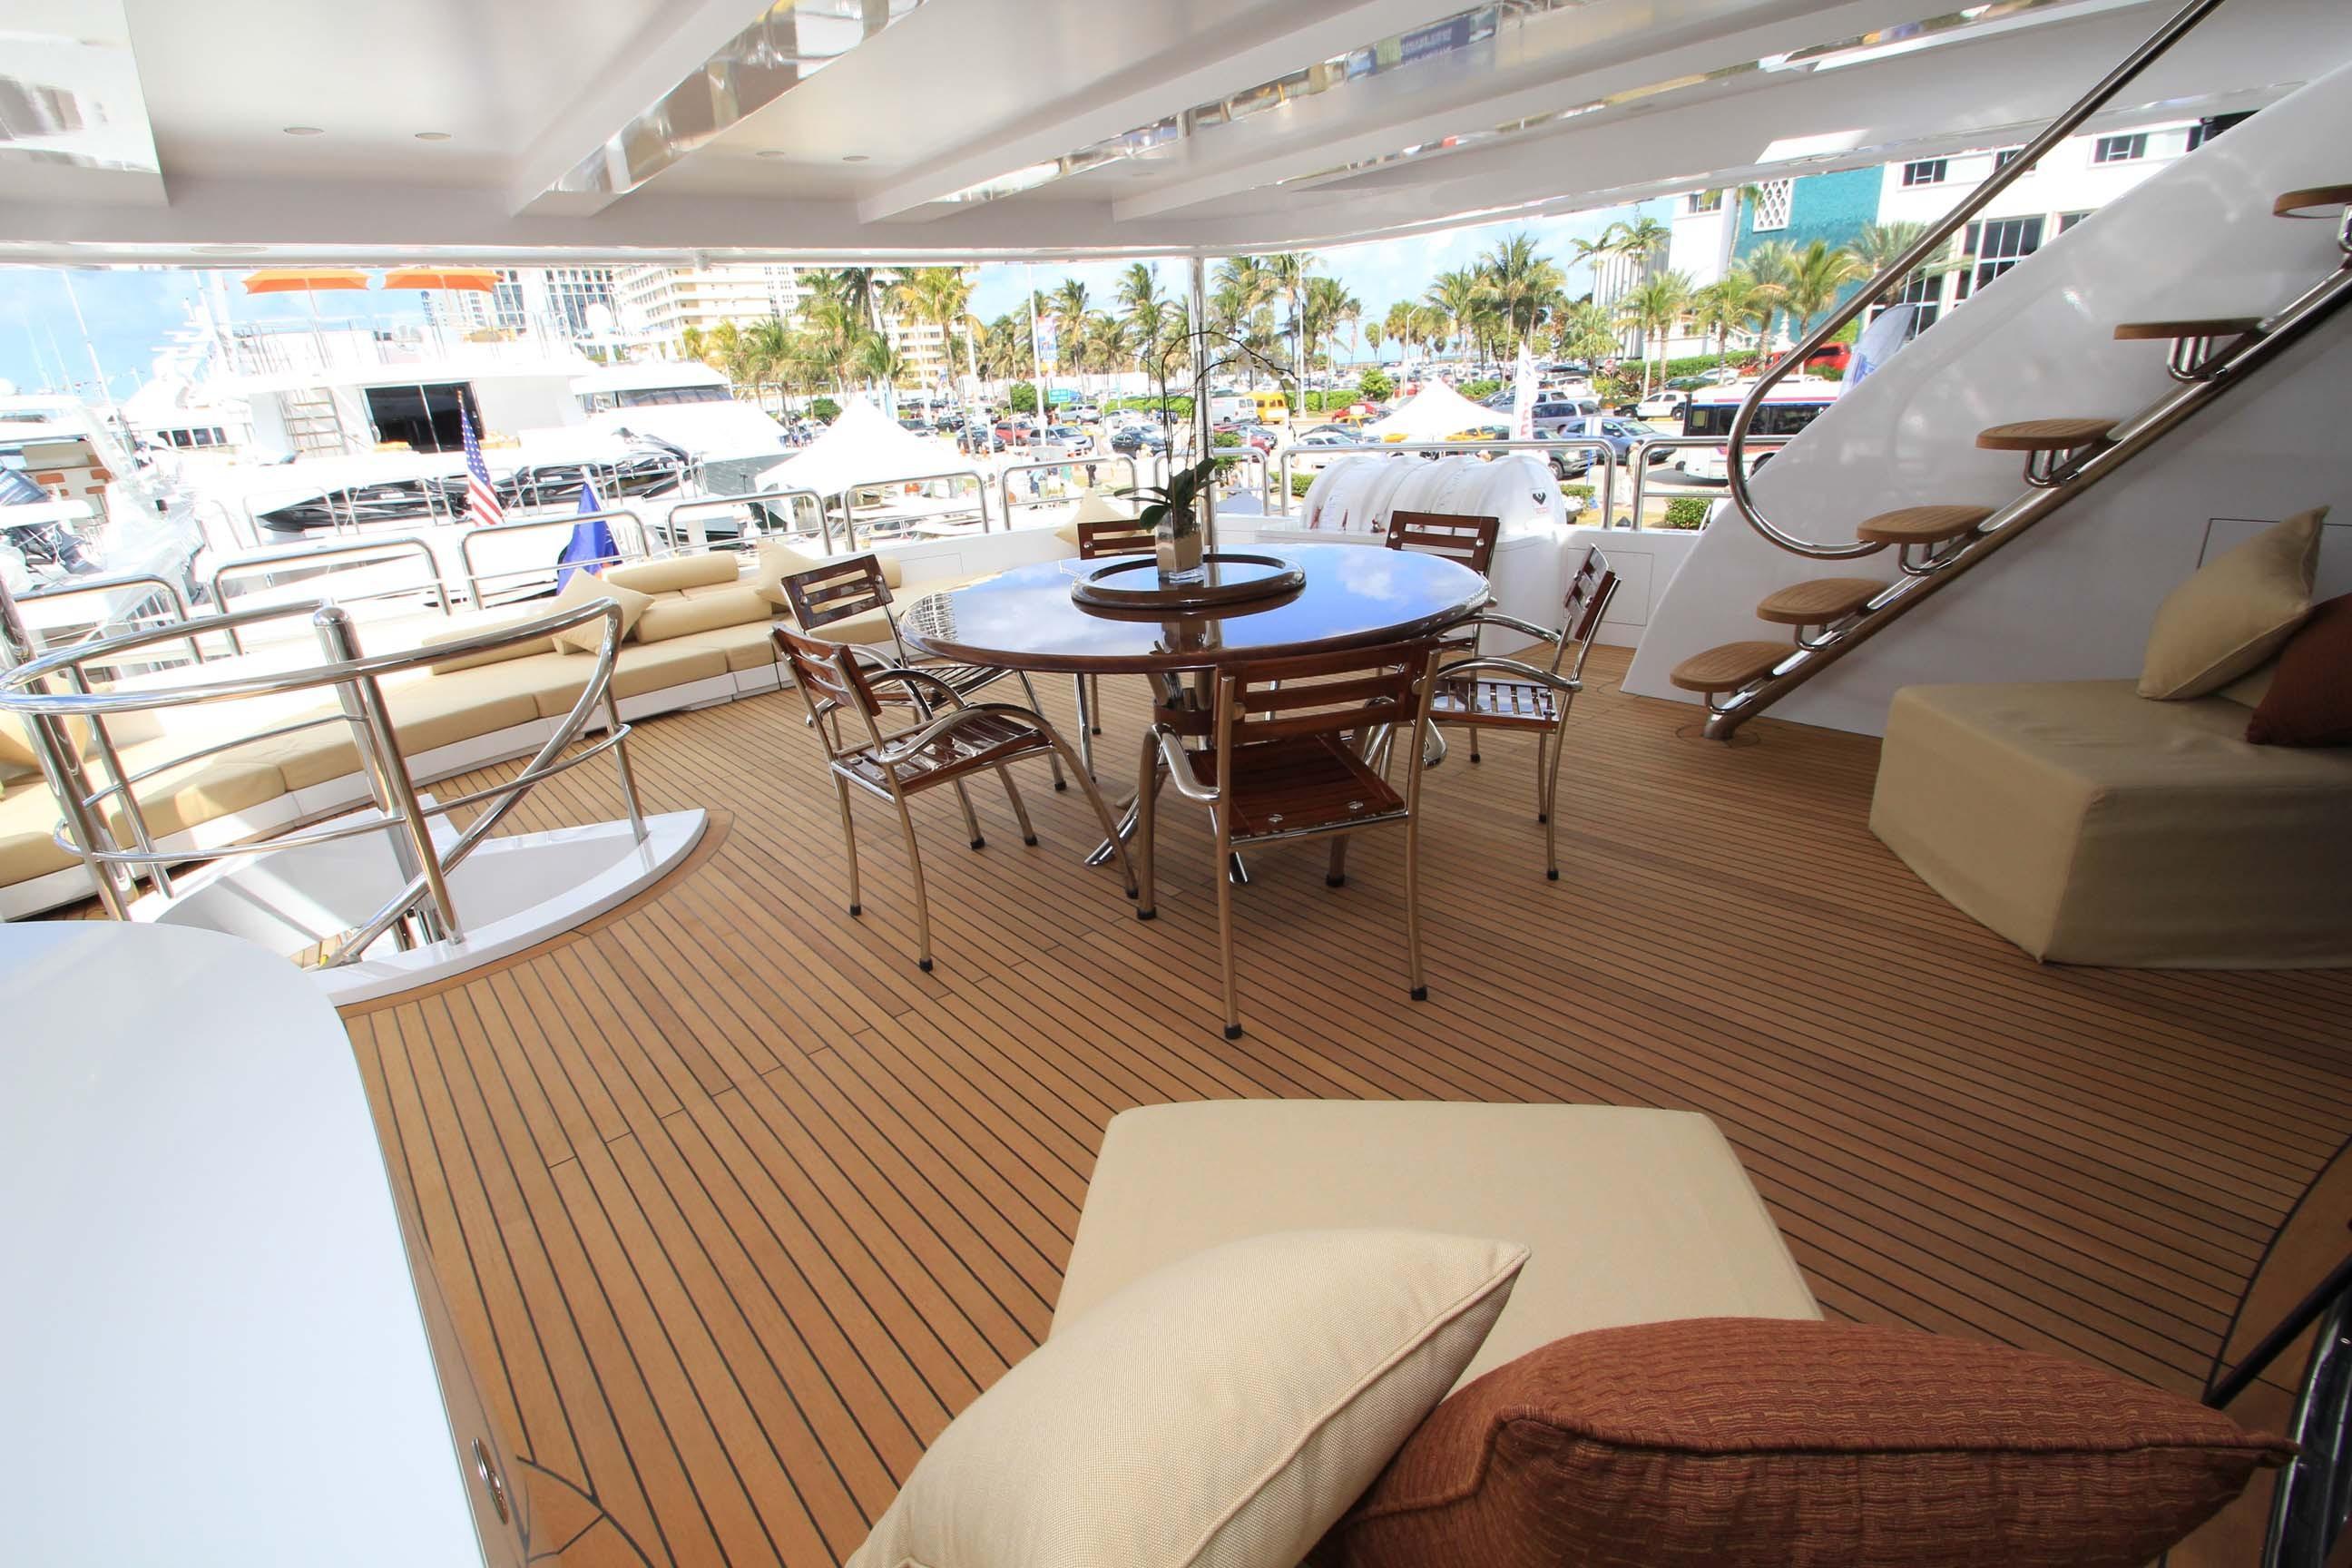 136 Hargrave Aft Sky Lounge